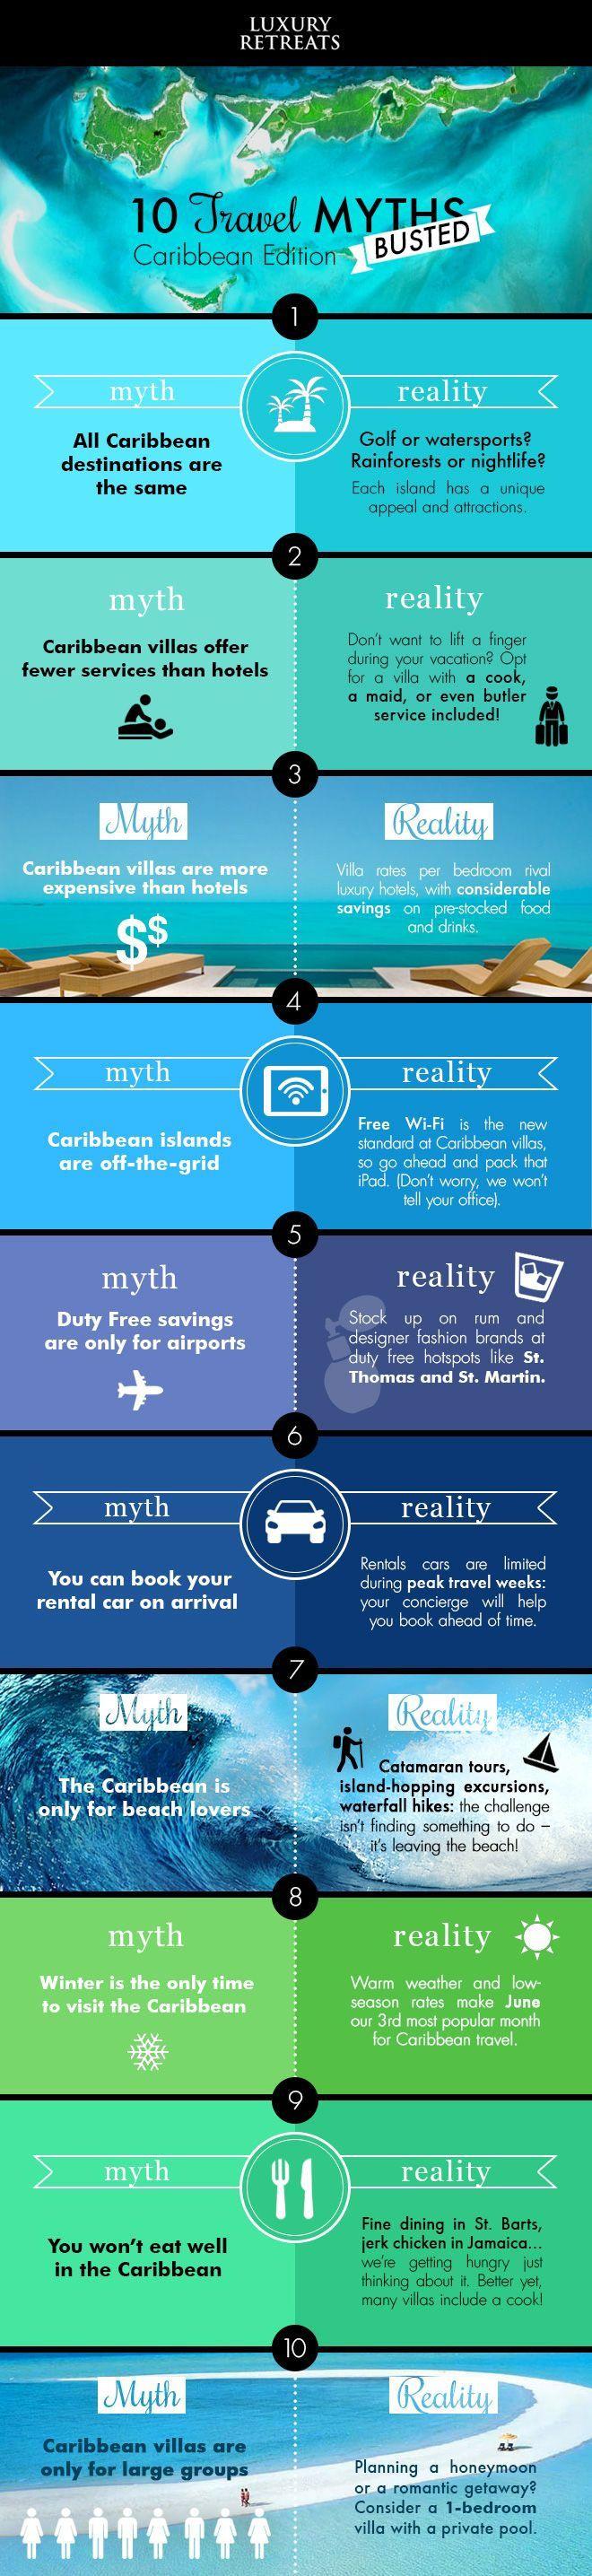 Caribbean Villa Vacations Travel Myths: #Travel, #Caribbean, #infographic, #vacations